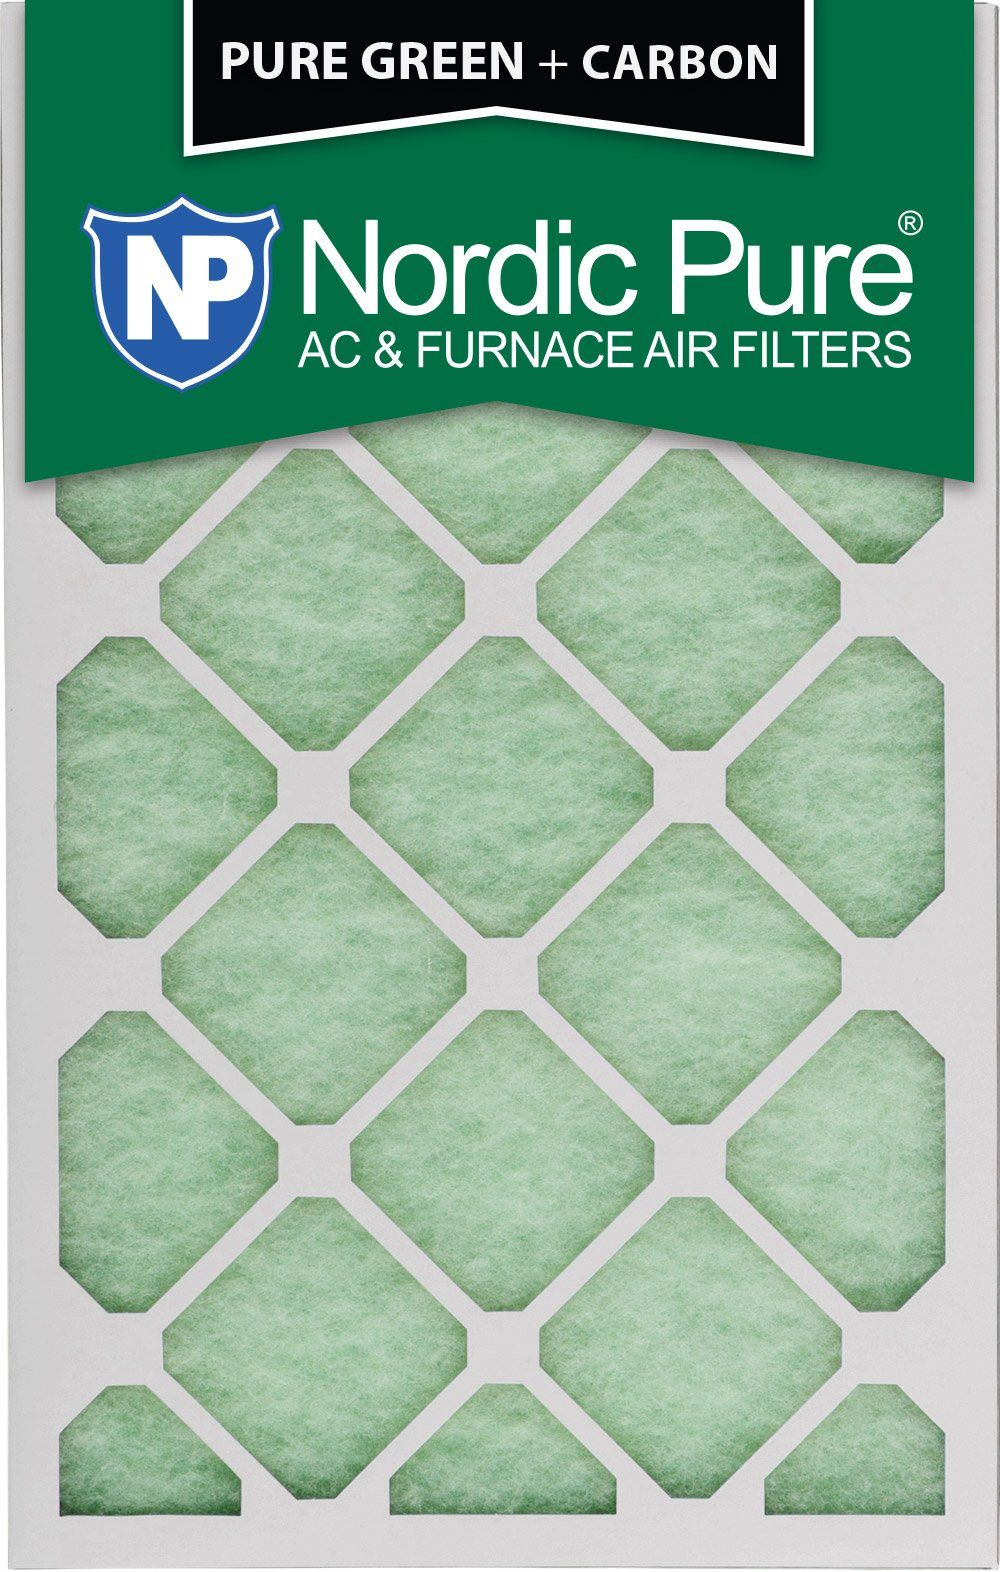 Nordic Pure 16x20x1 Pure Green Plus Carbon EcoFriendly AC